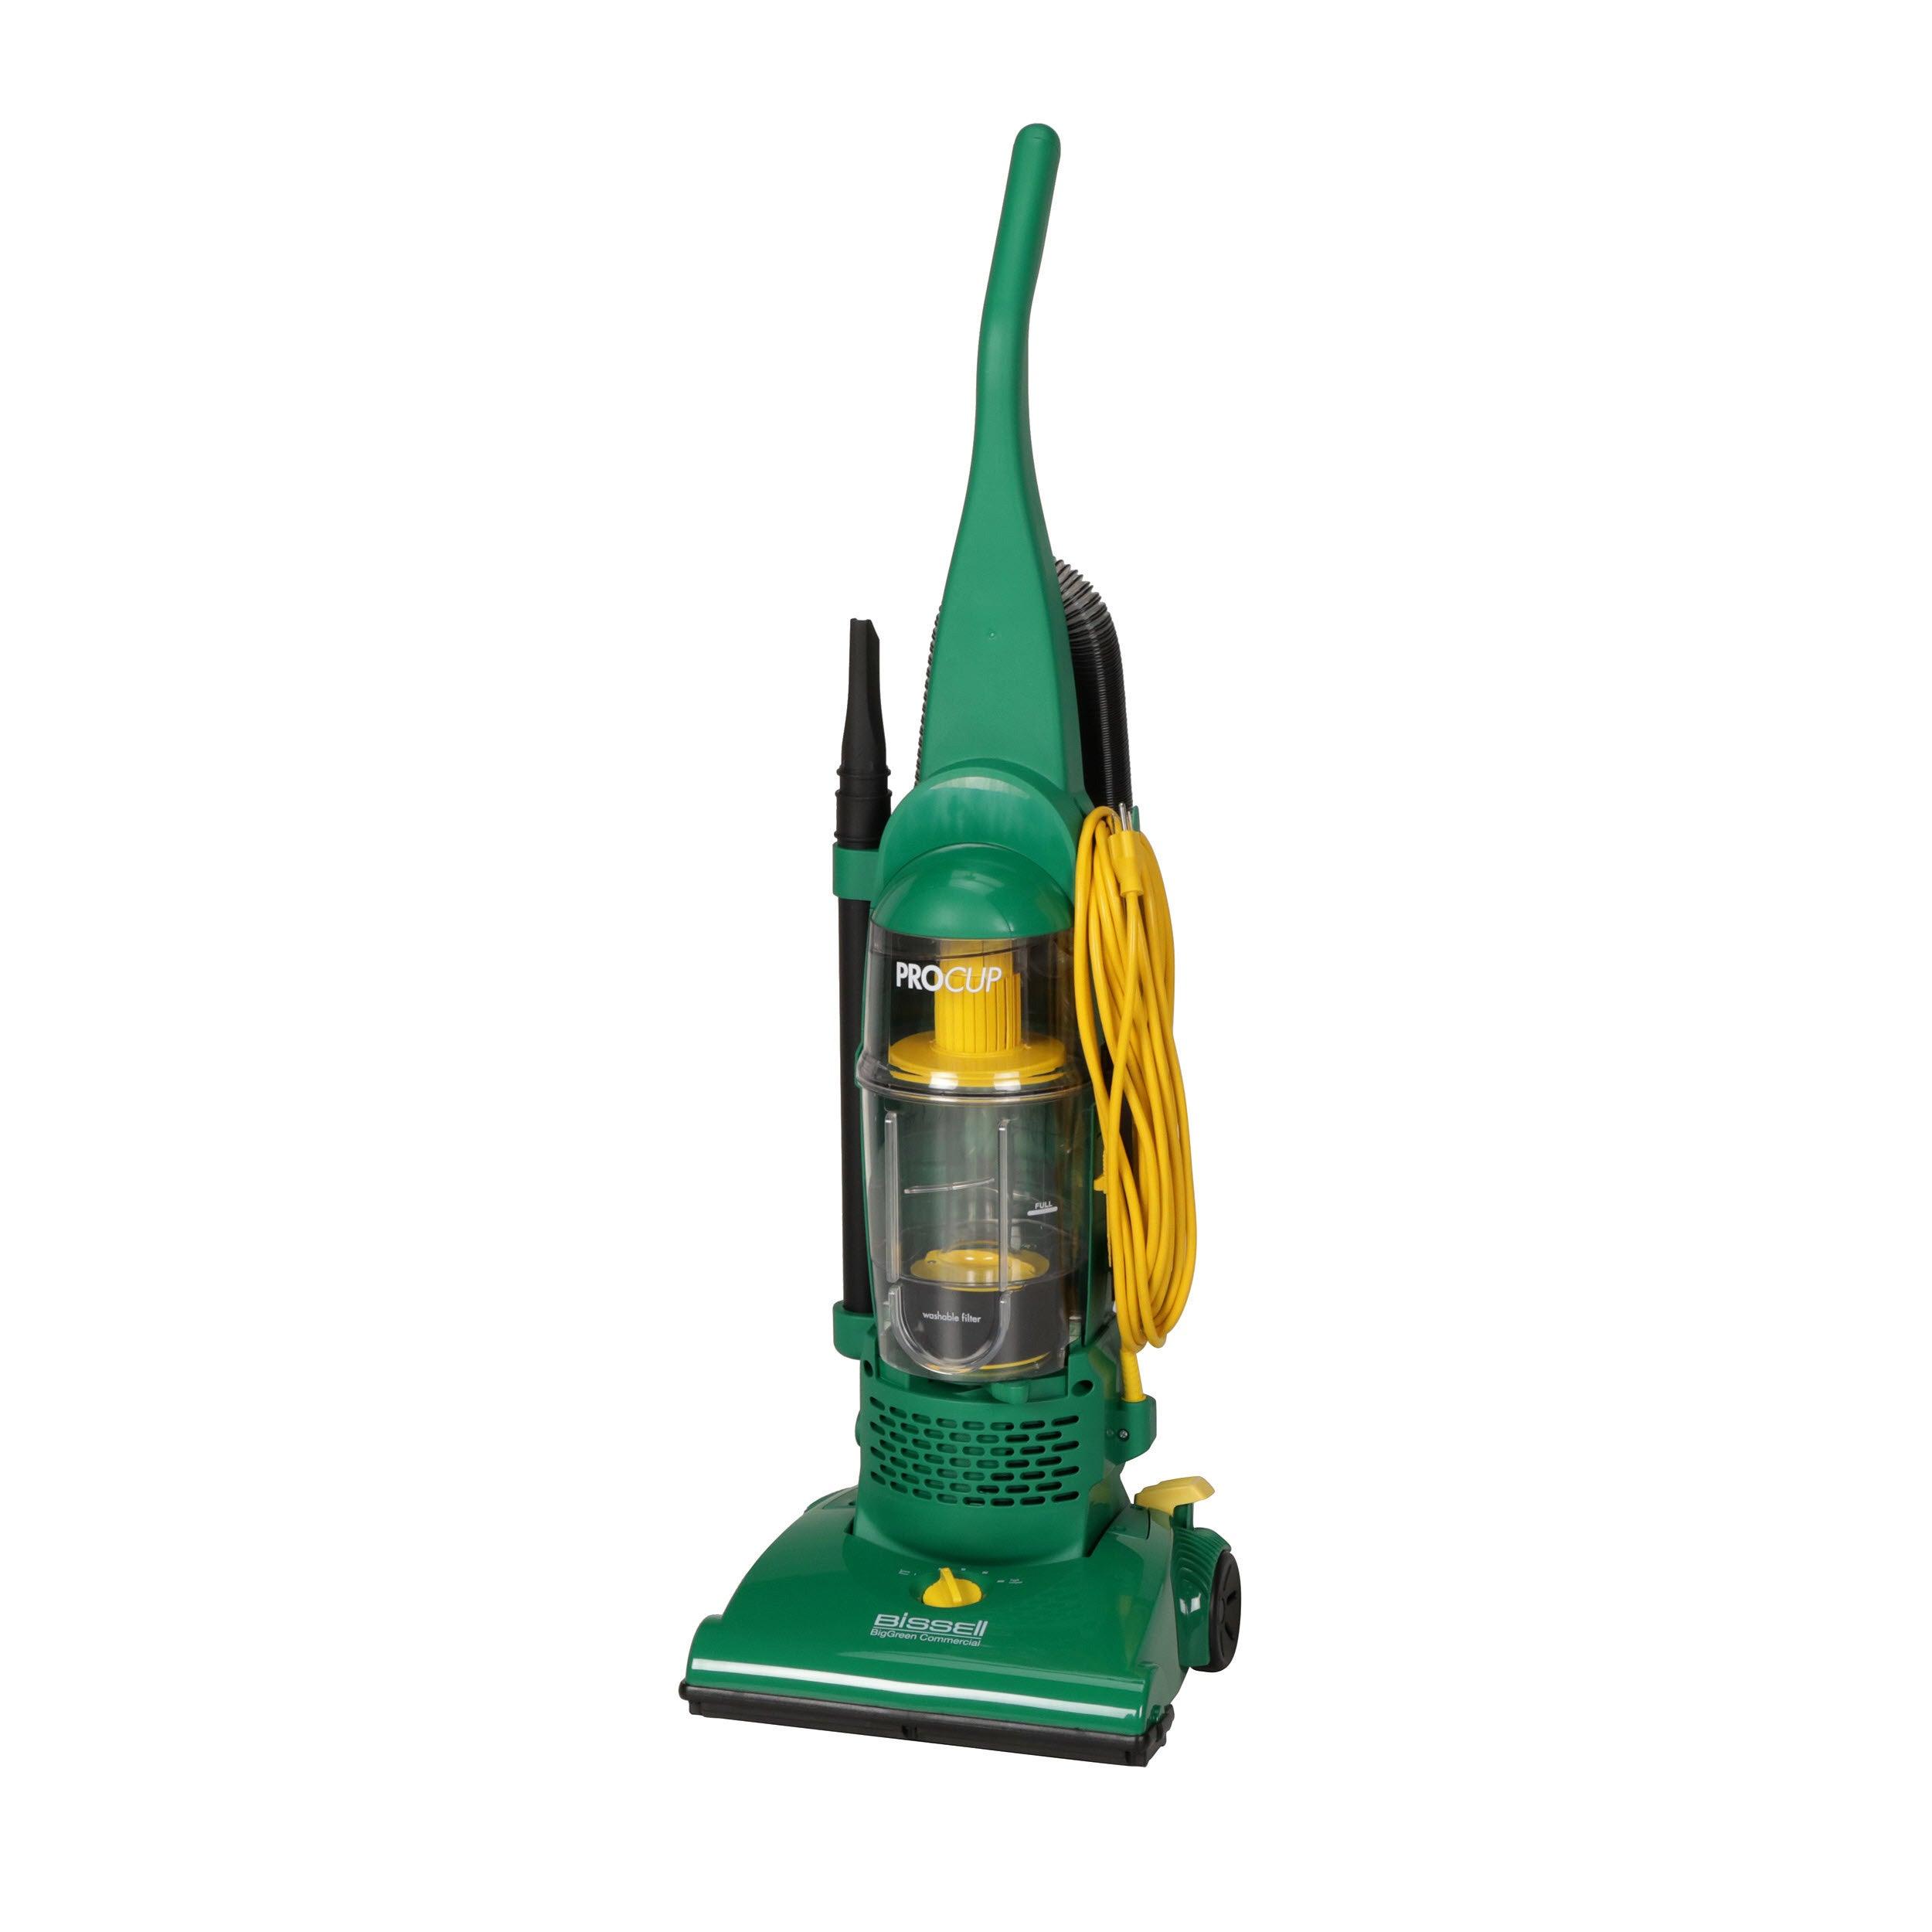 Bissell BG1006 BigGreen Commercial Premier Backpack Vacuum Cleaner